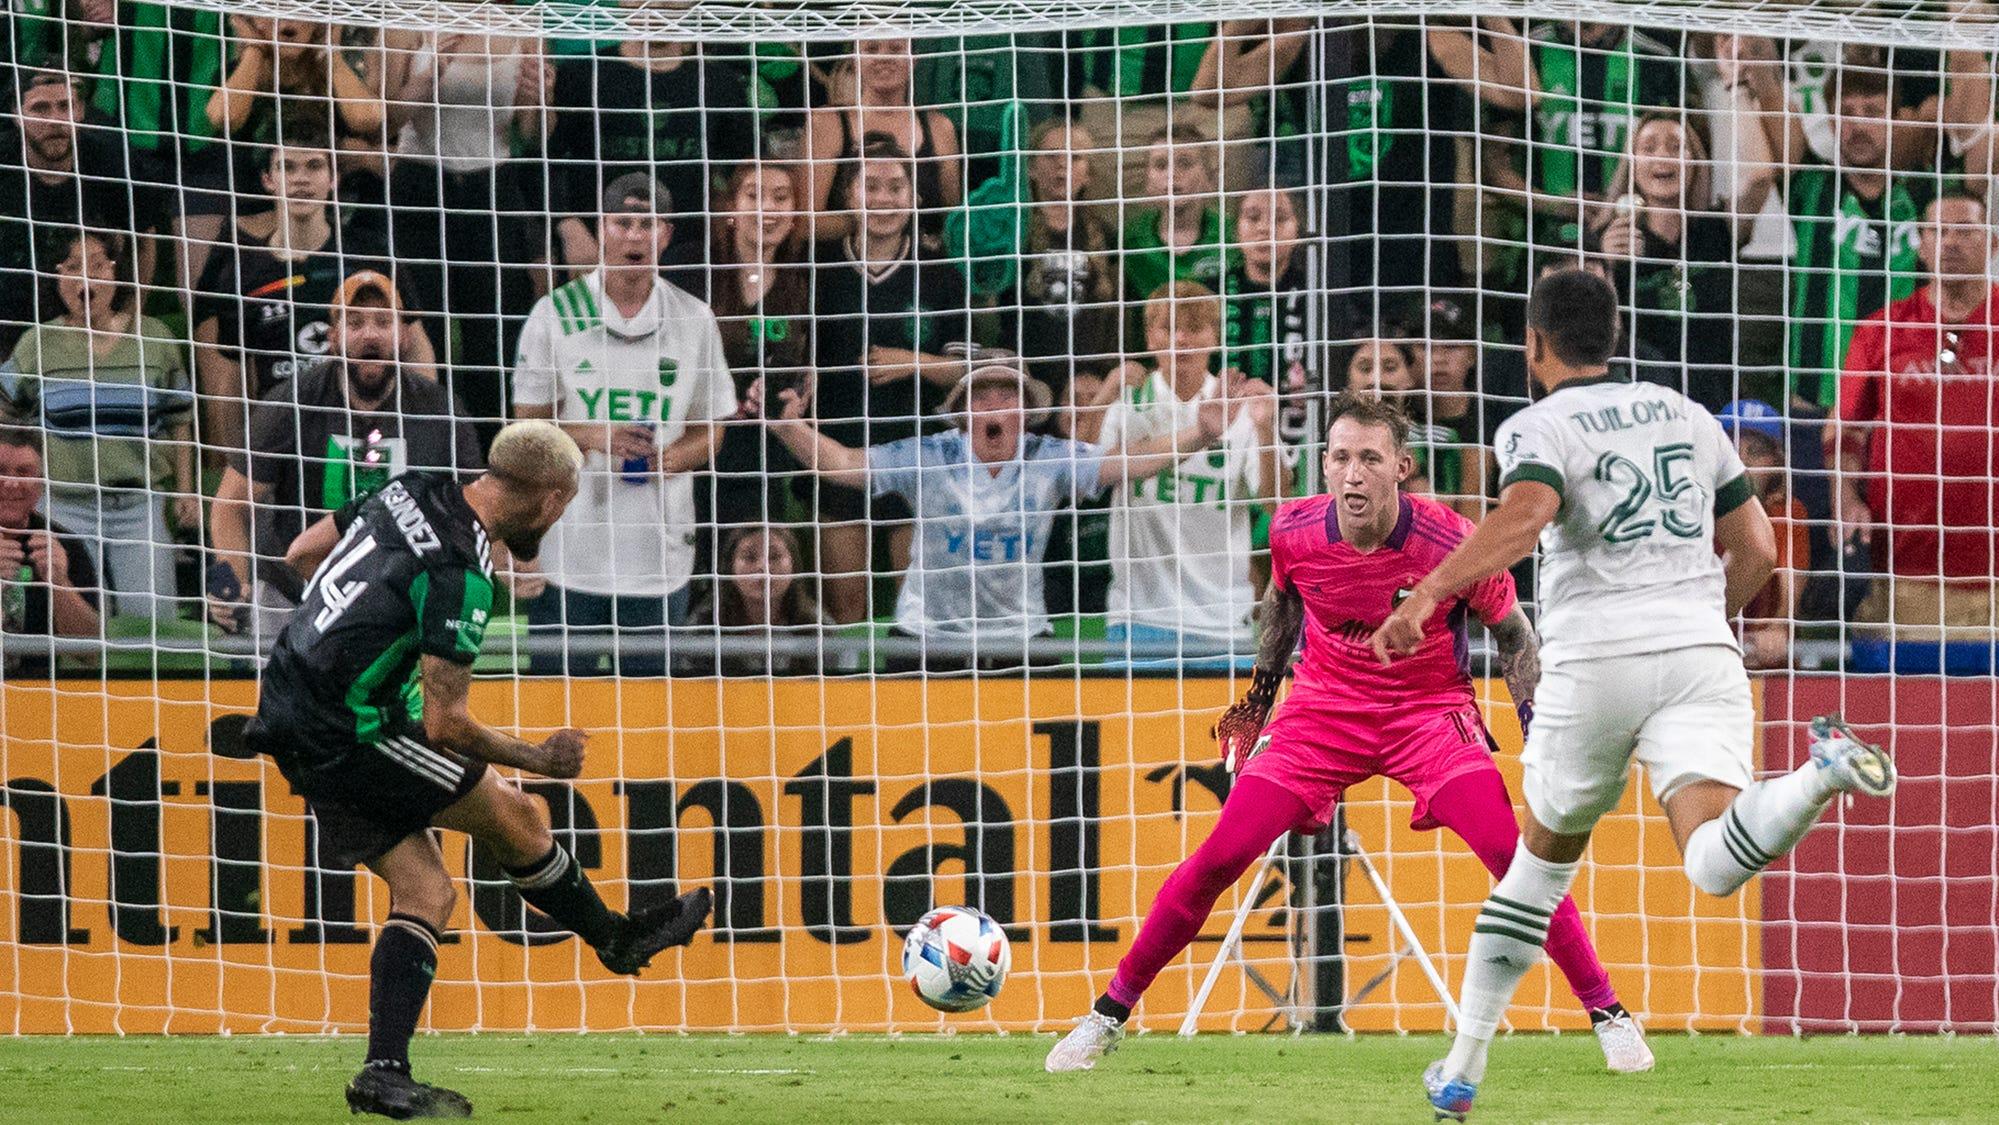 Live blog: Austin FC defeats Portland Timbers 4-1 at Q2 Stadium